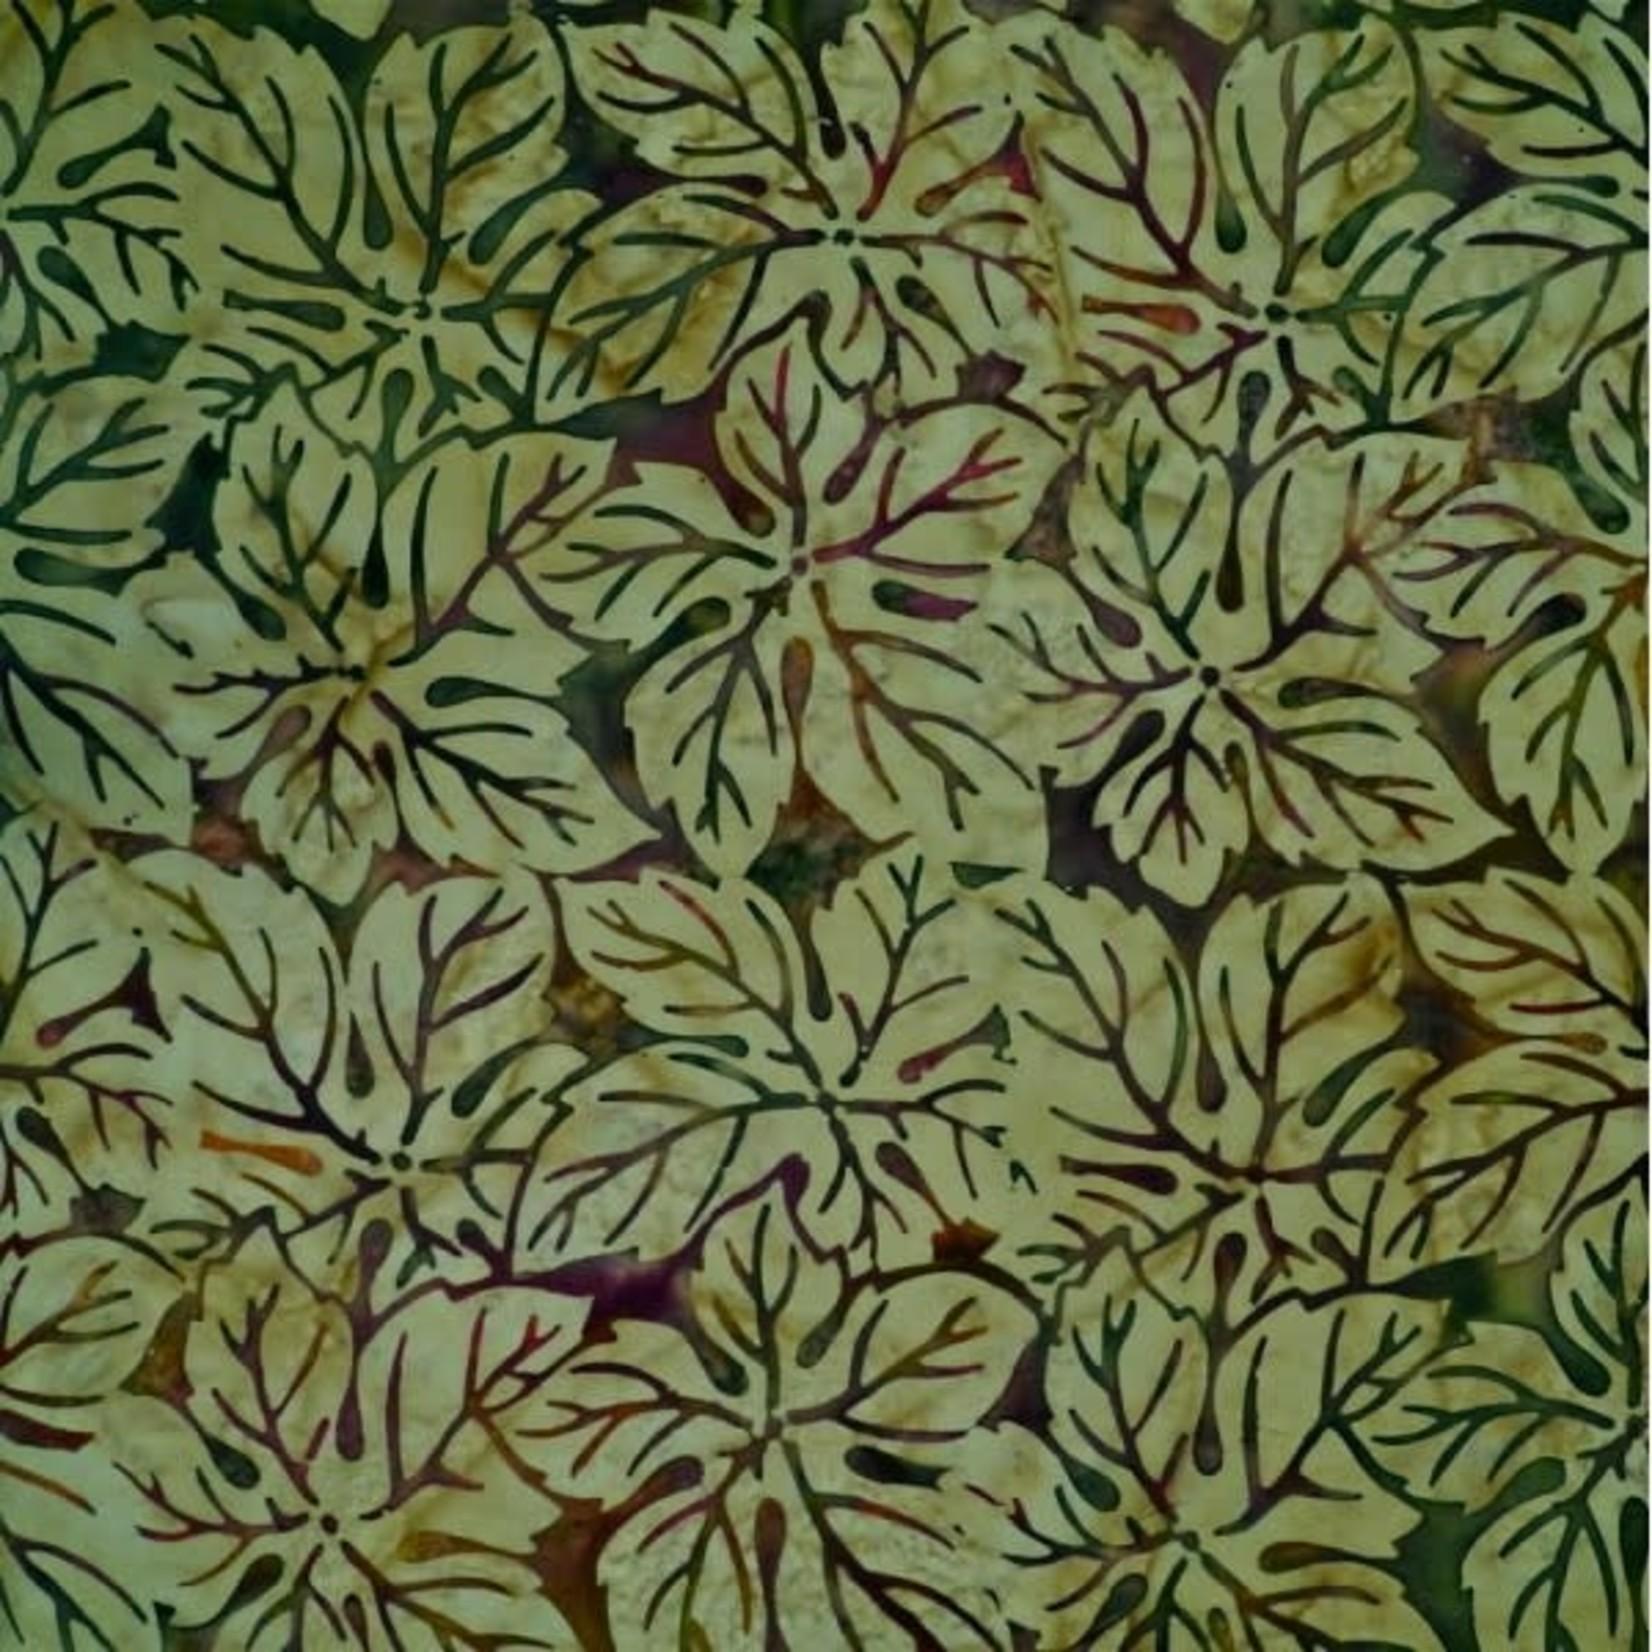 Mirah Zriya Batik by Mirah, Nutshell, Cedar Olive NS-3-6207 $0.16 per cm or $16/m